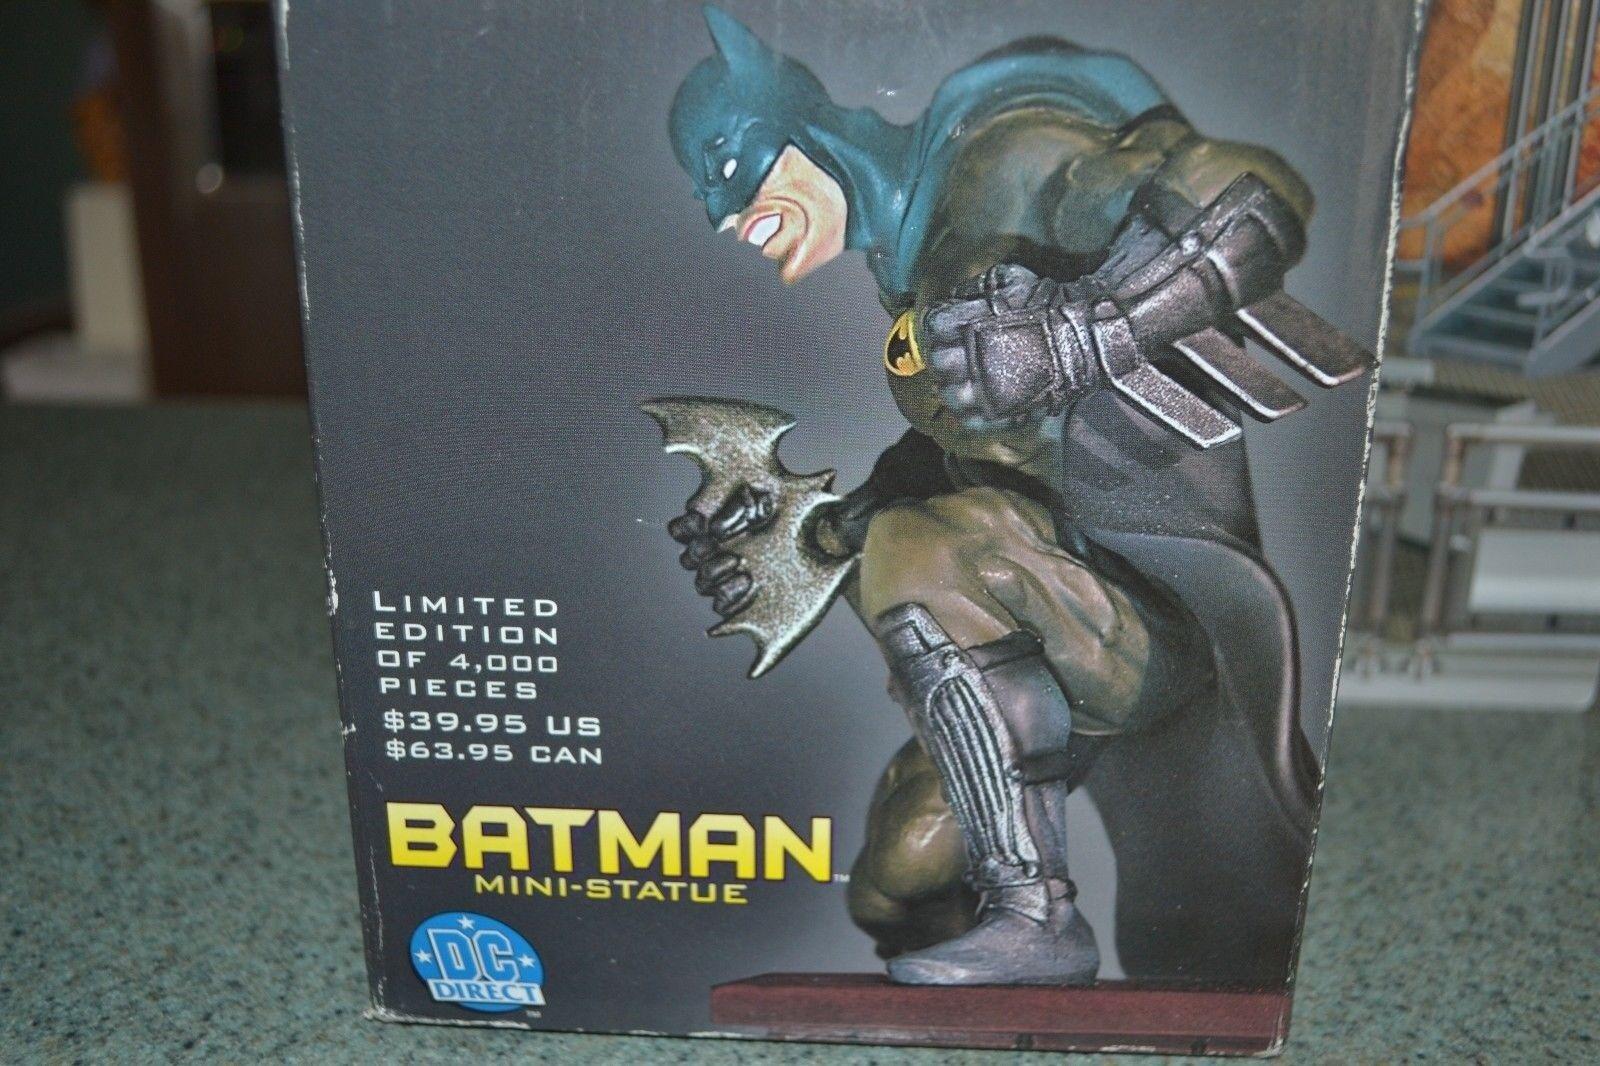 DC UNIVERSO DC estatua de Torre de Reloj de Batman DIRECT edición limitada de 4000